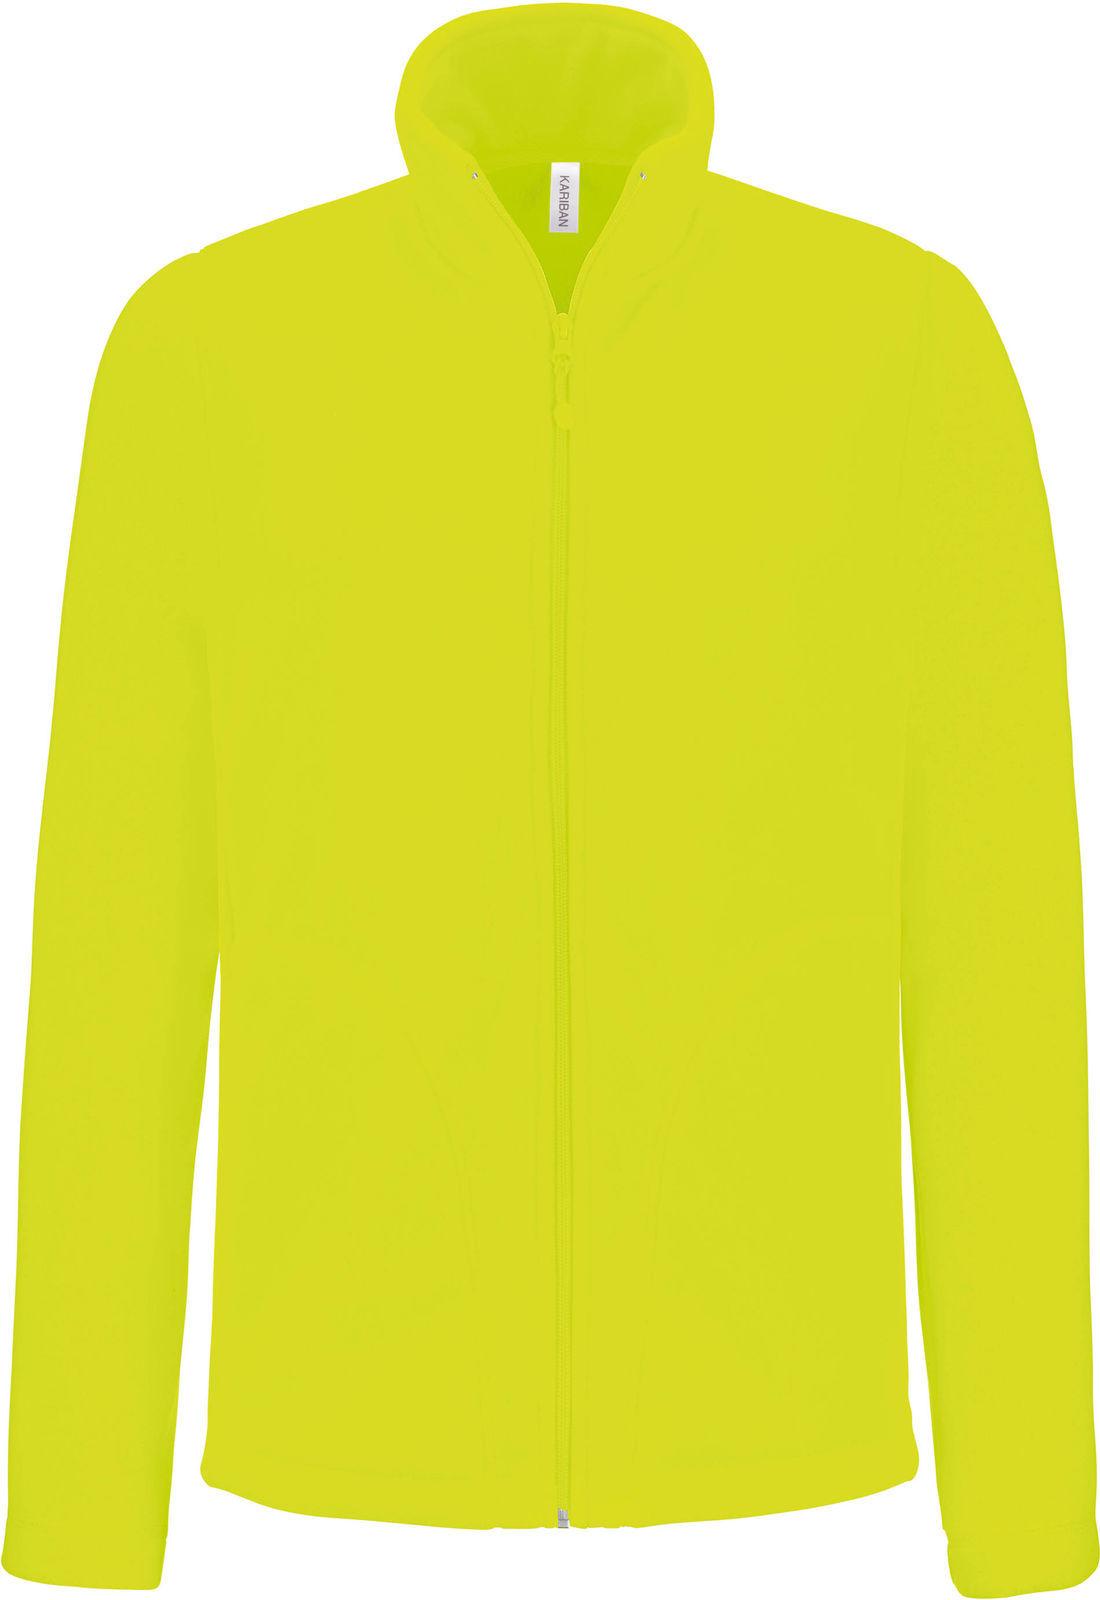 Veste polaire jaune fluo